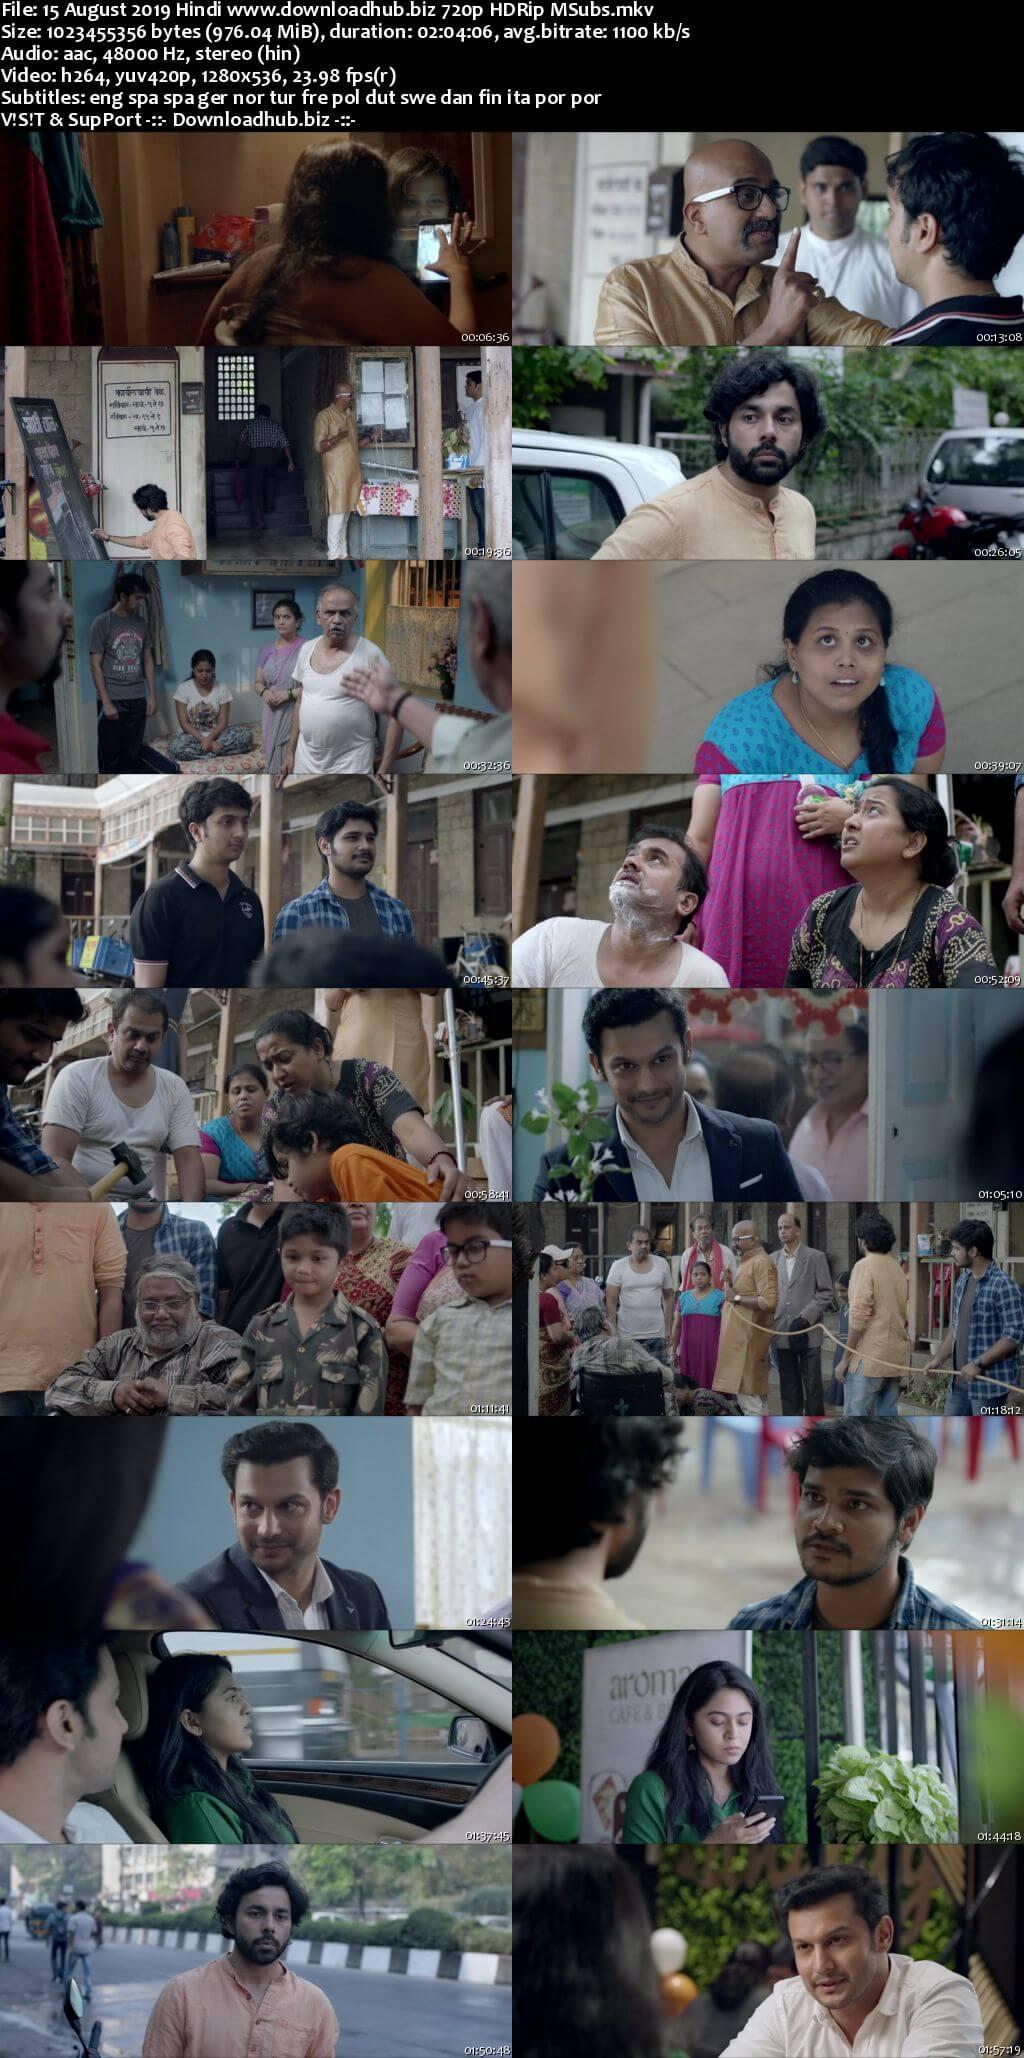 15 August 2019 Hindi 720p HDRip MSubs